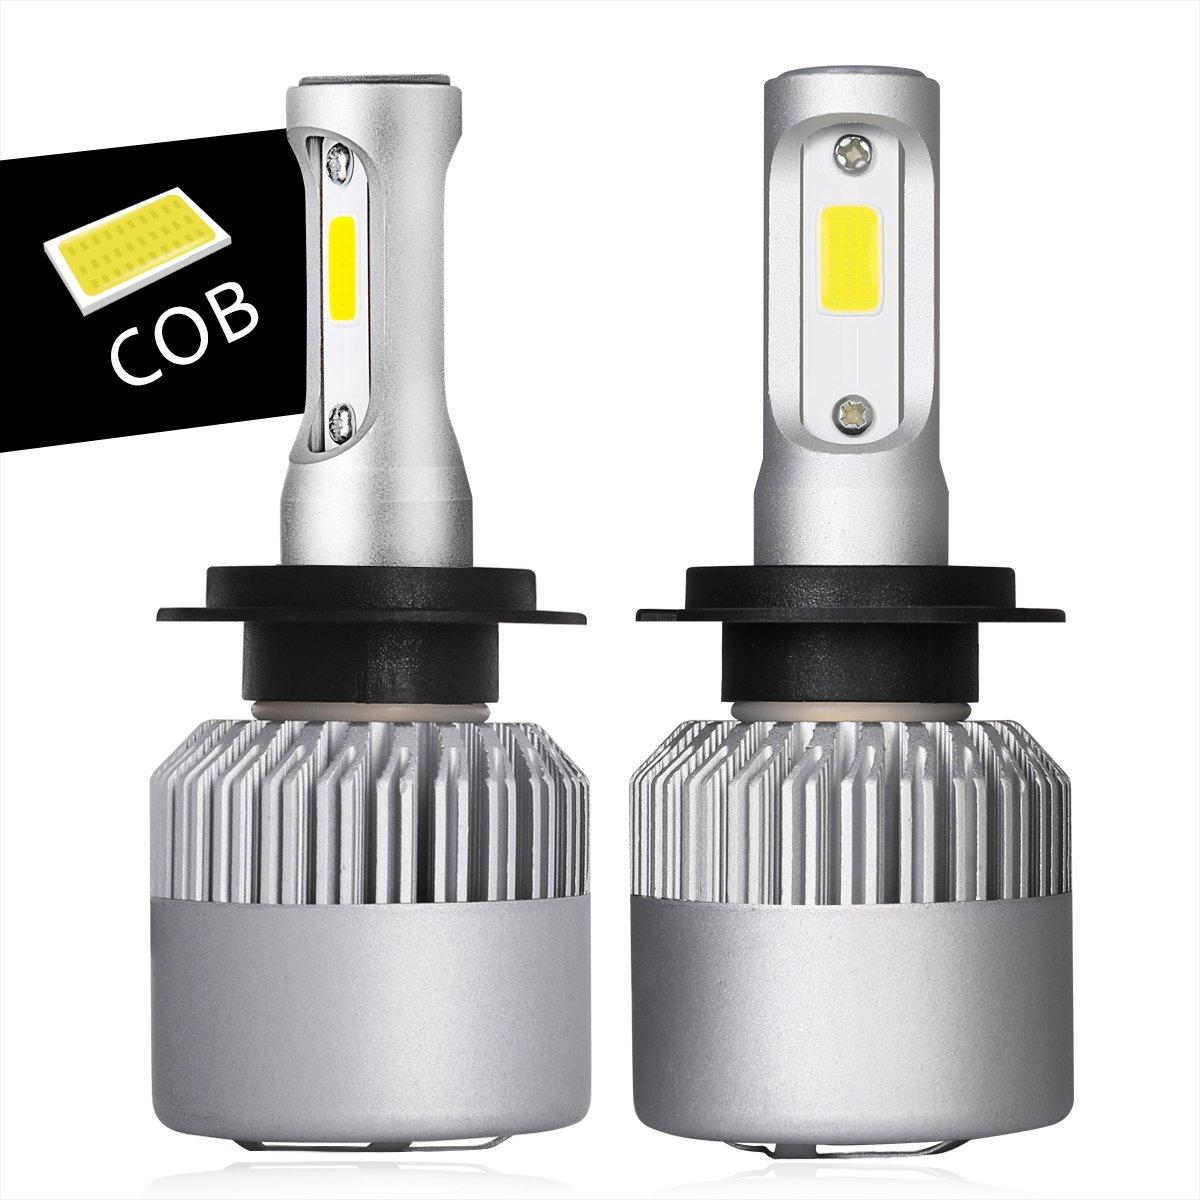 H7 LED Headlight Bulbs, Swatow Industries H7 Headlight Kits Osram COB 10,000lm 6000K Cool White 2PCS - 2 Year Warranty